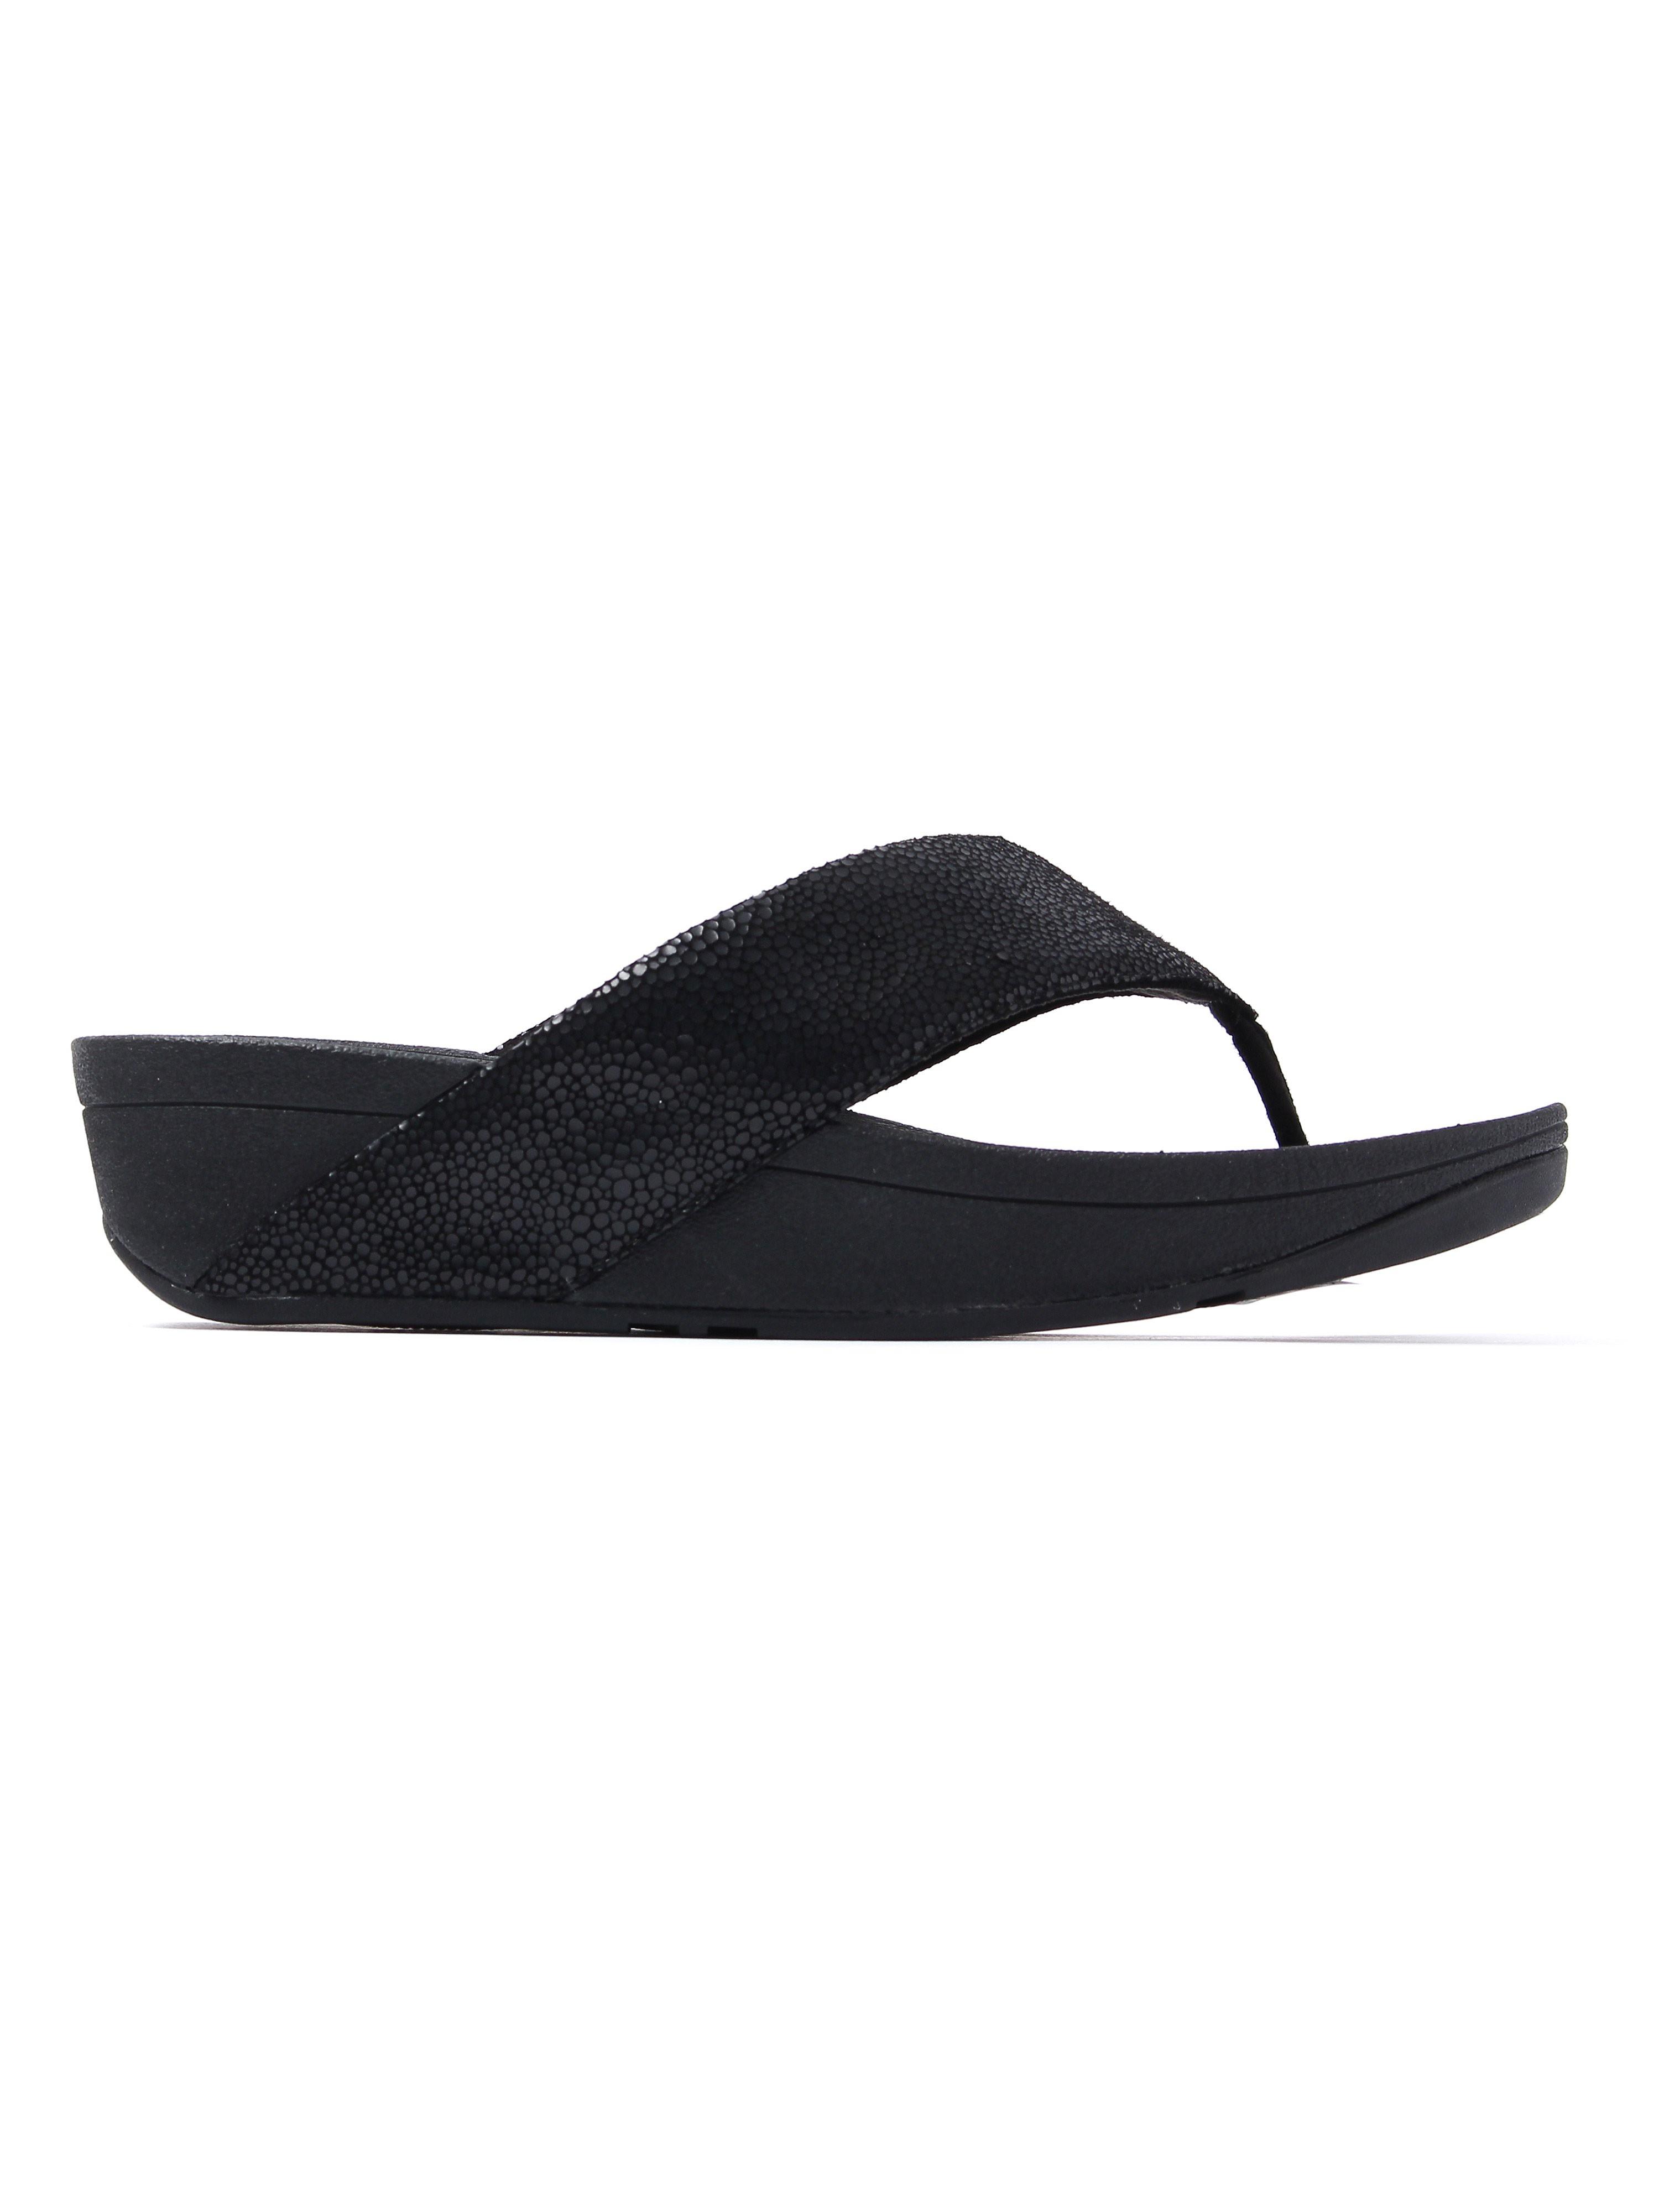 FitFlop Women's Swoop Toe Thong Sandals - Black